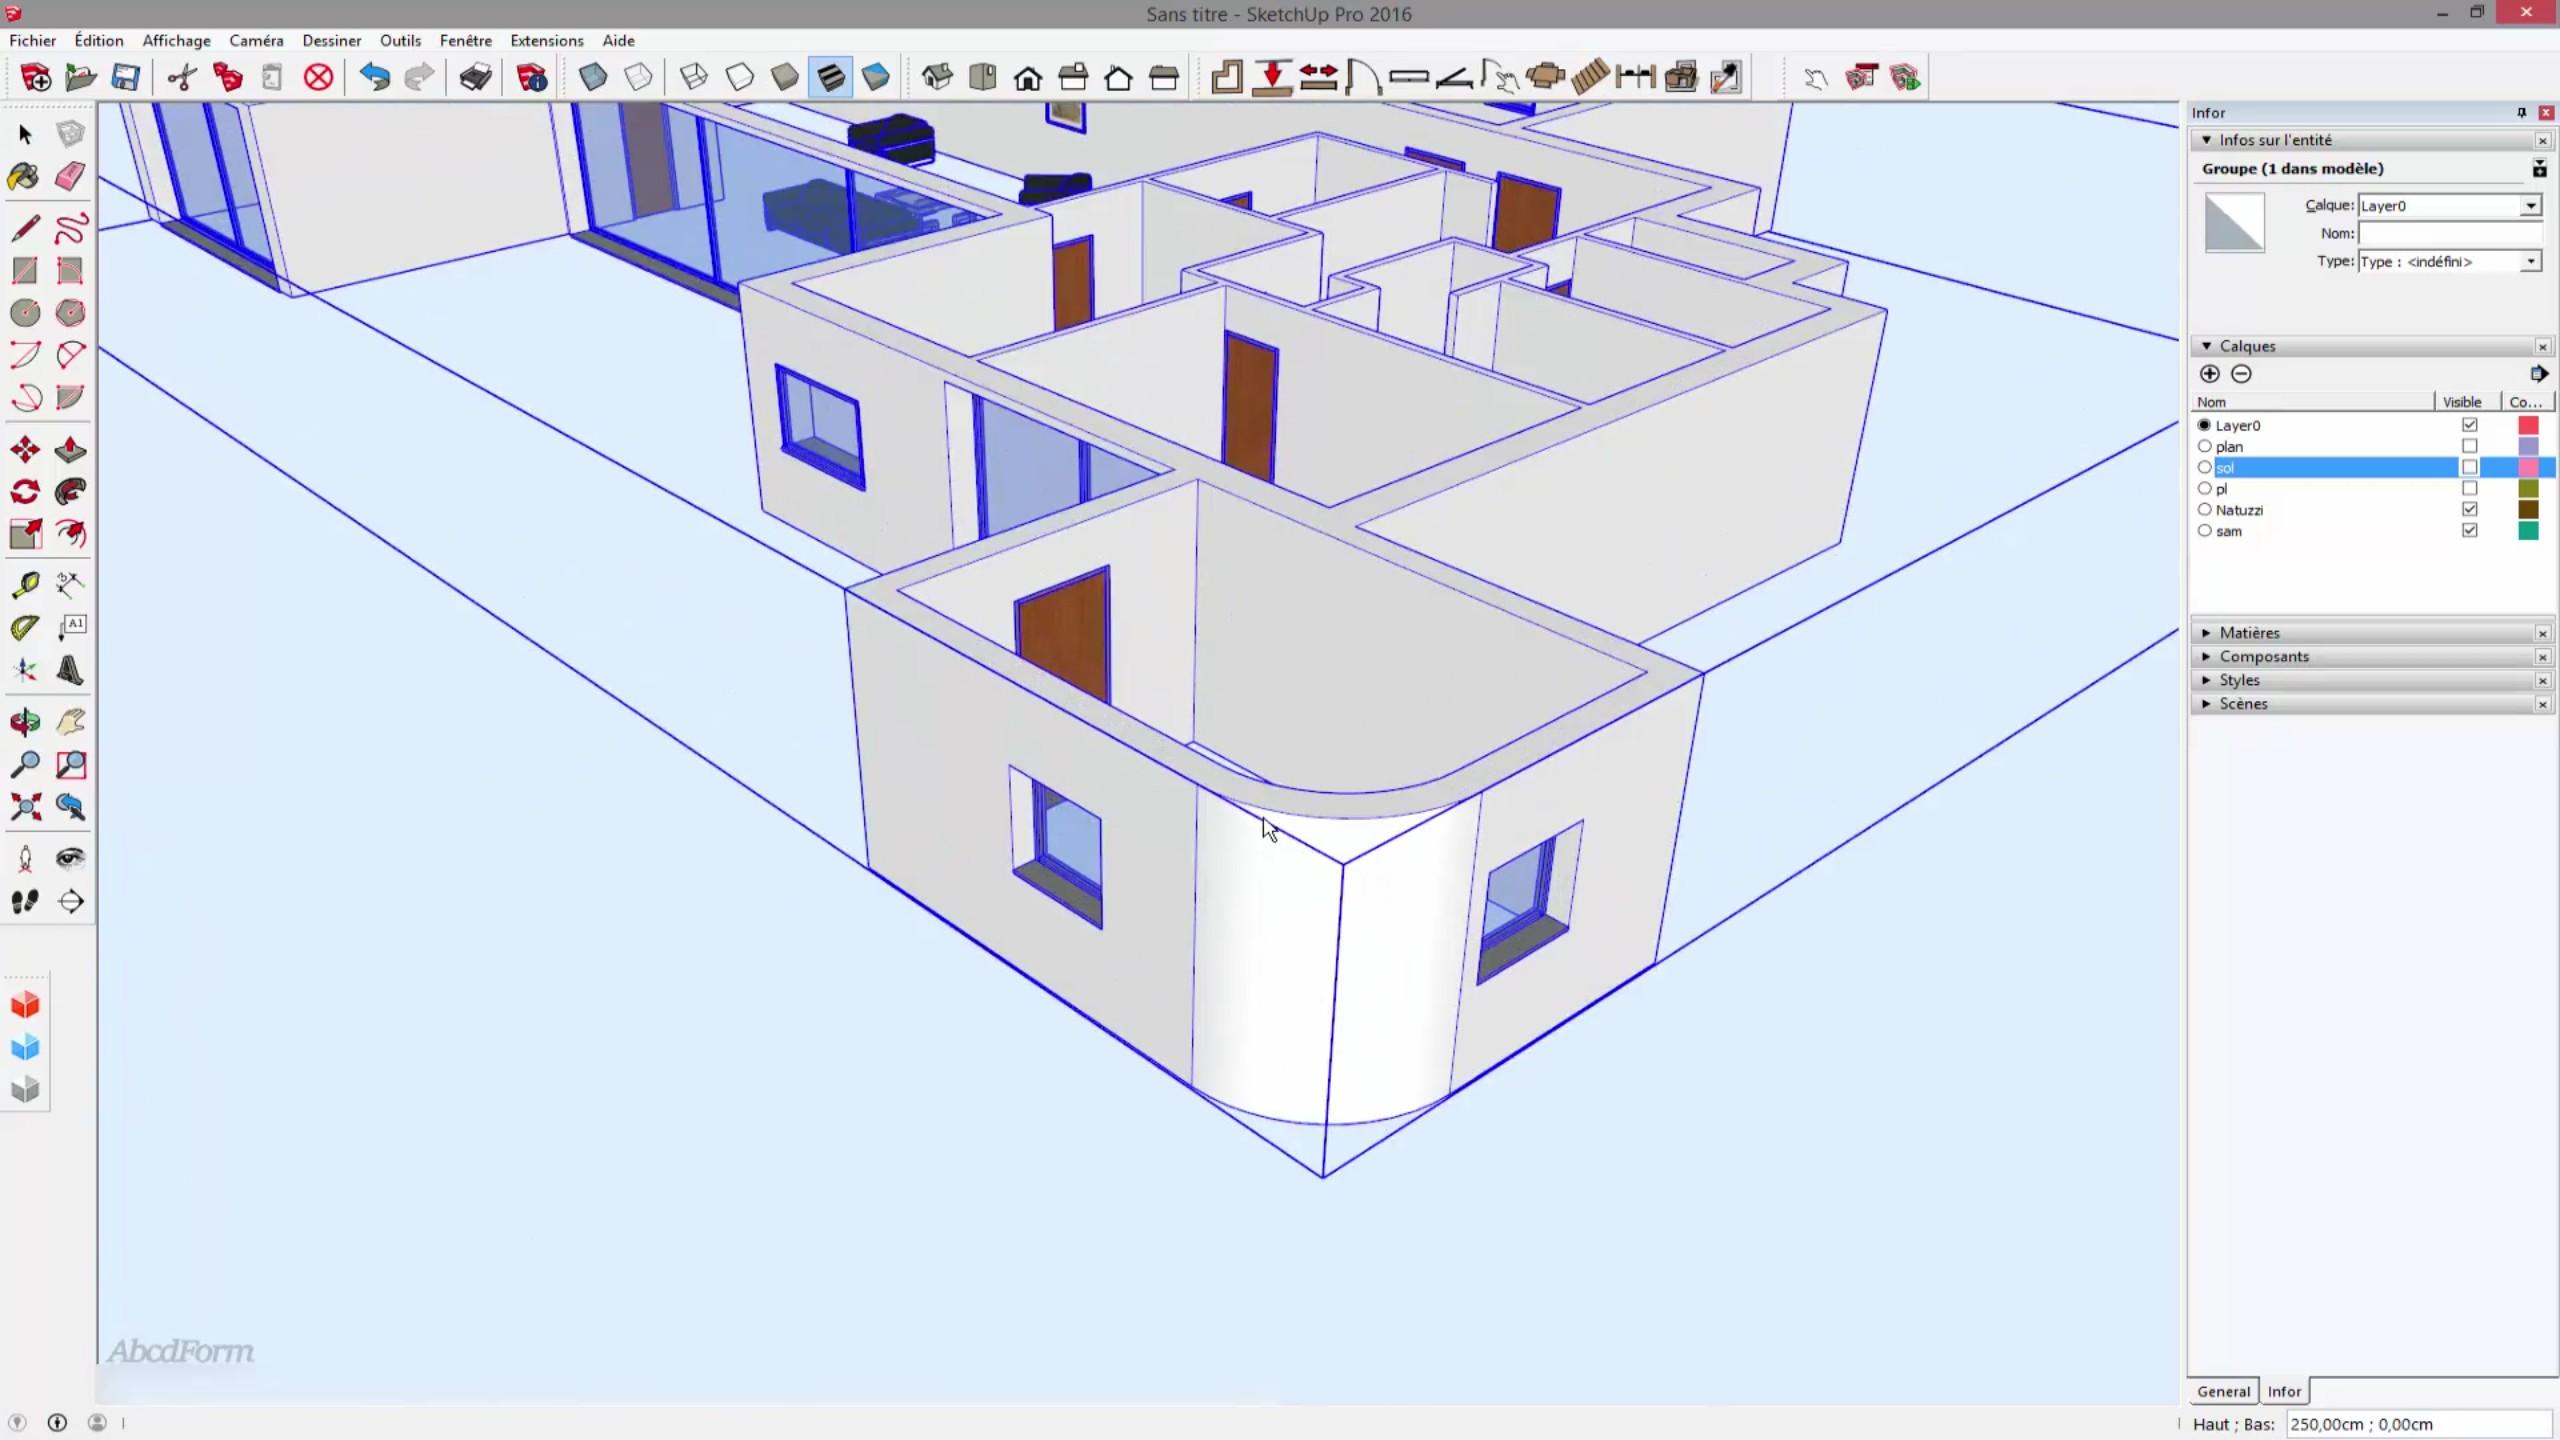 Crer plan maison en ligne faire plan maison en ligne for Dessiner jardin en ligne